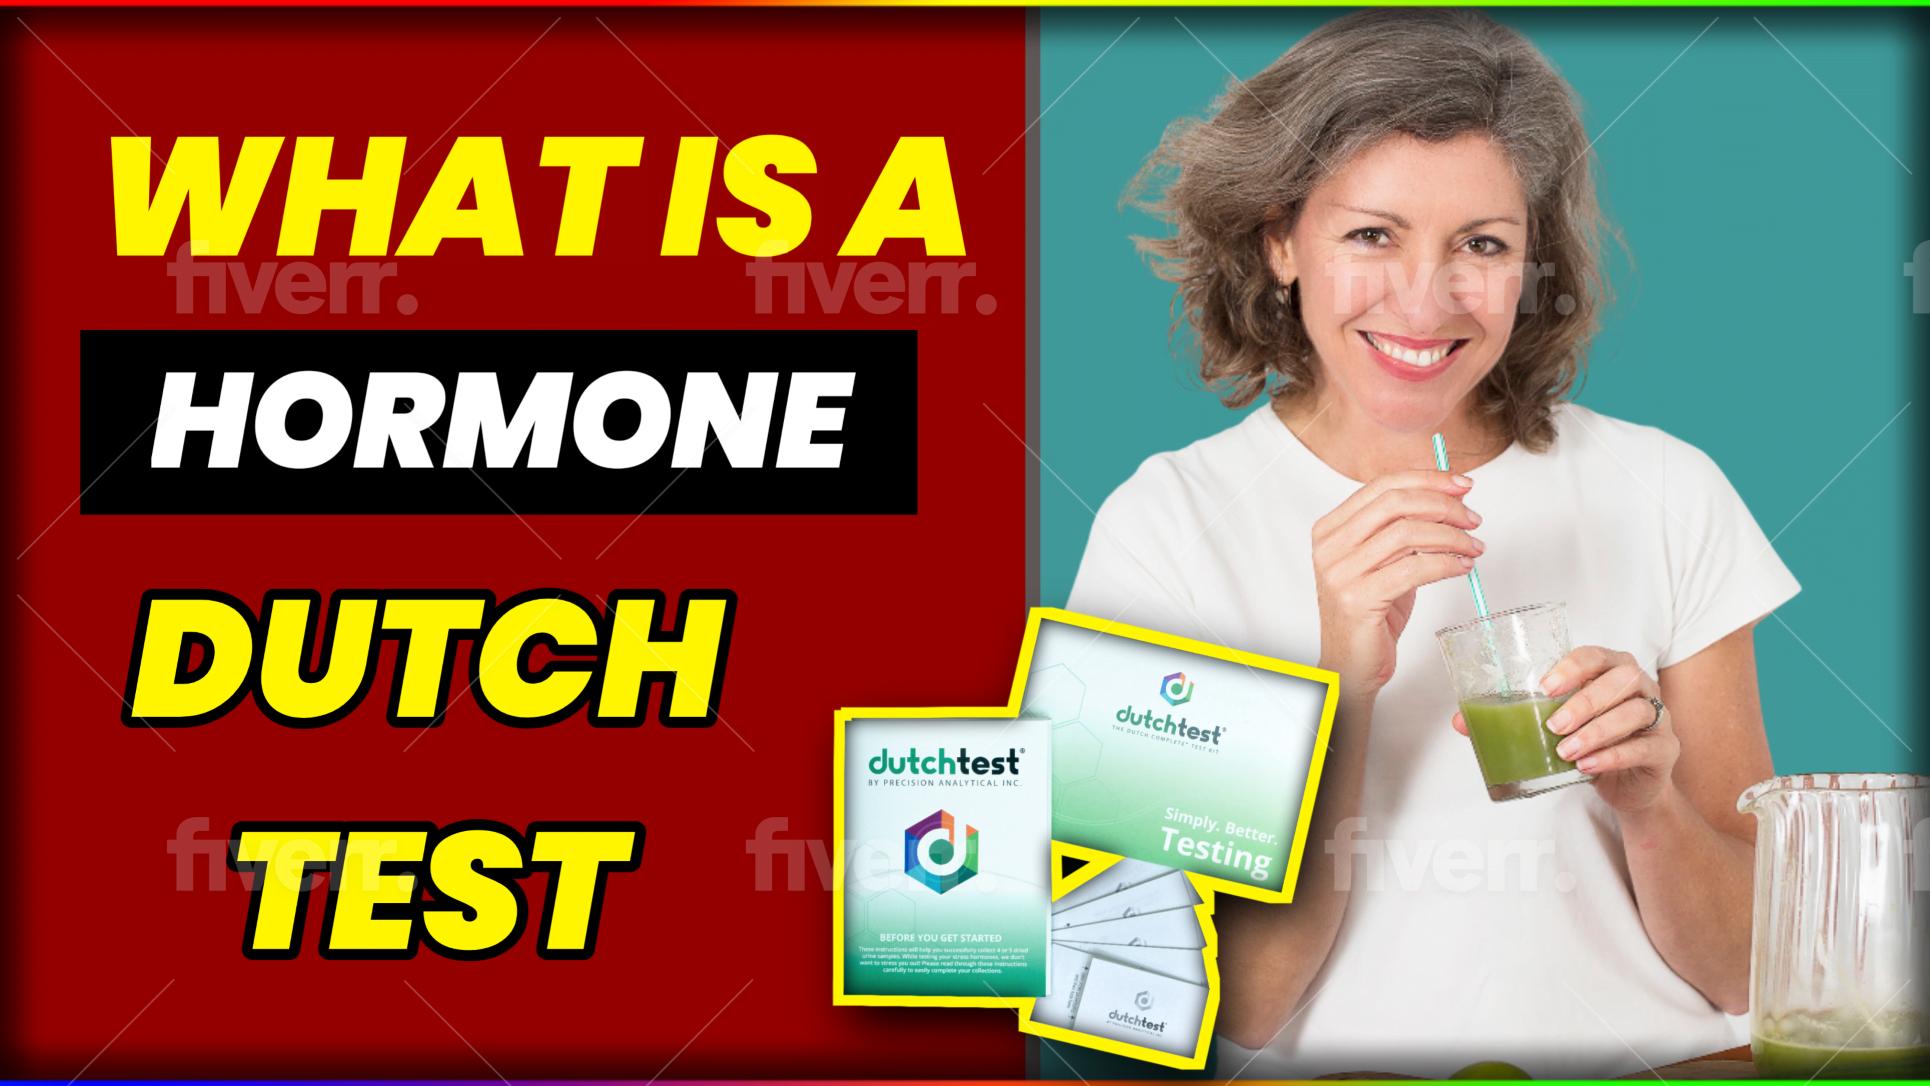 Do you wonder if you have hormone imbalances?